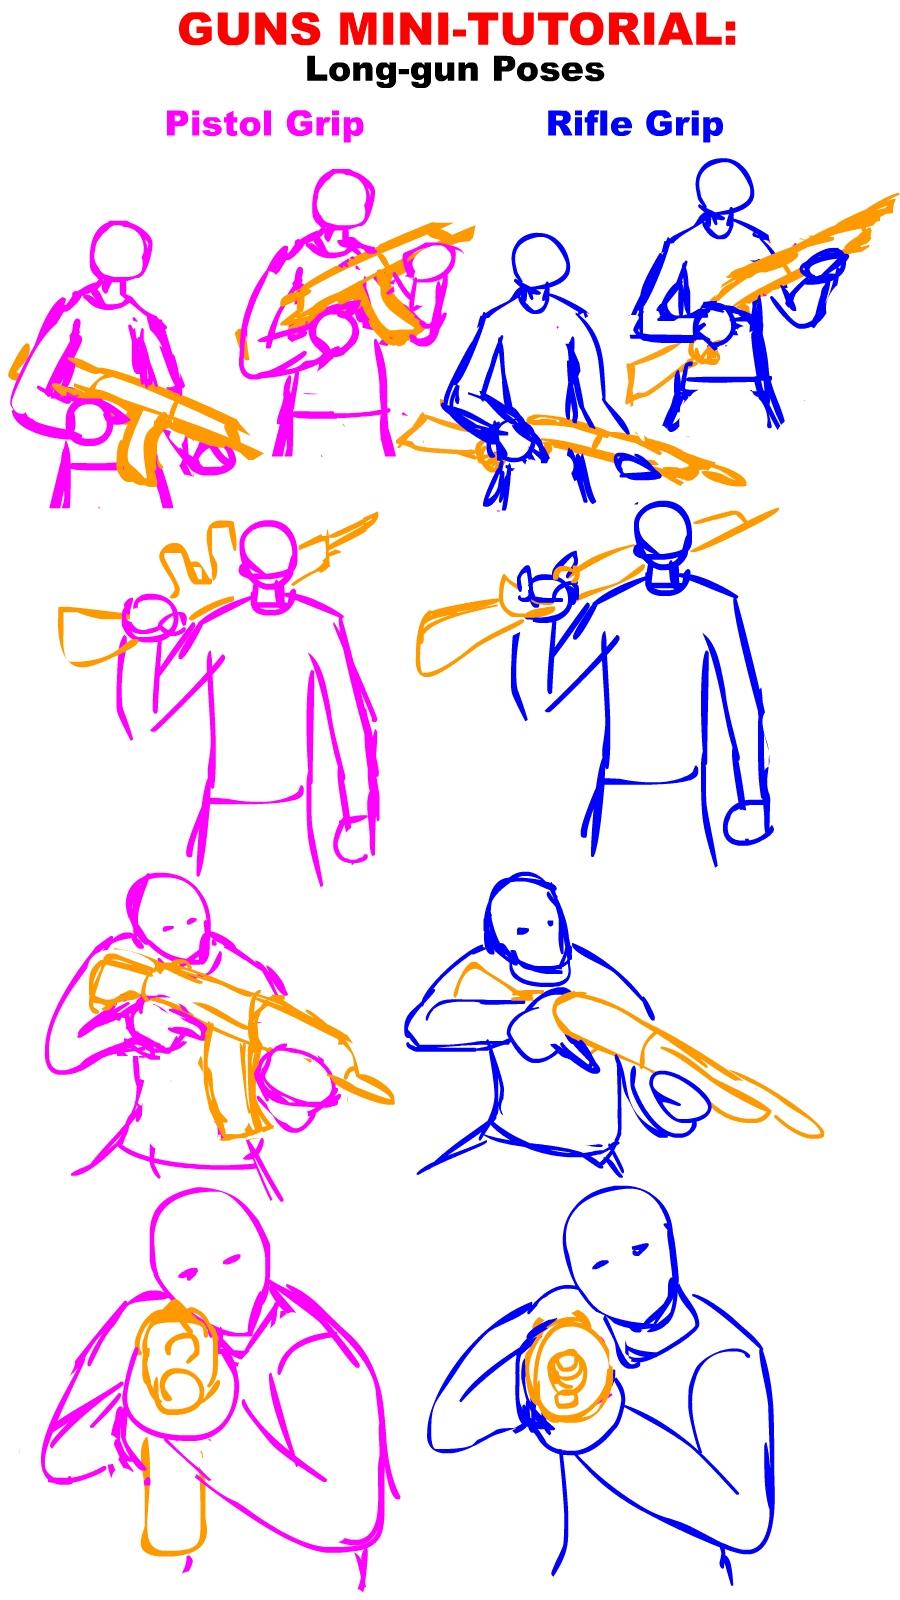 Drawn pistol cool gun Gun on Guns  Long